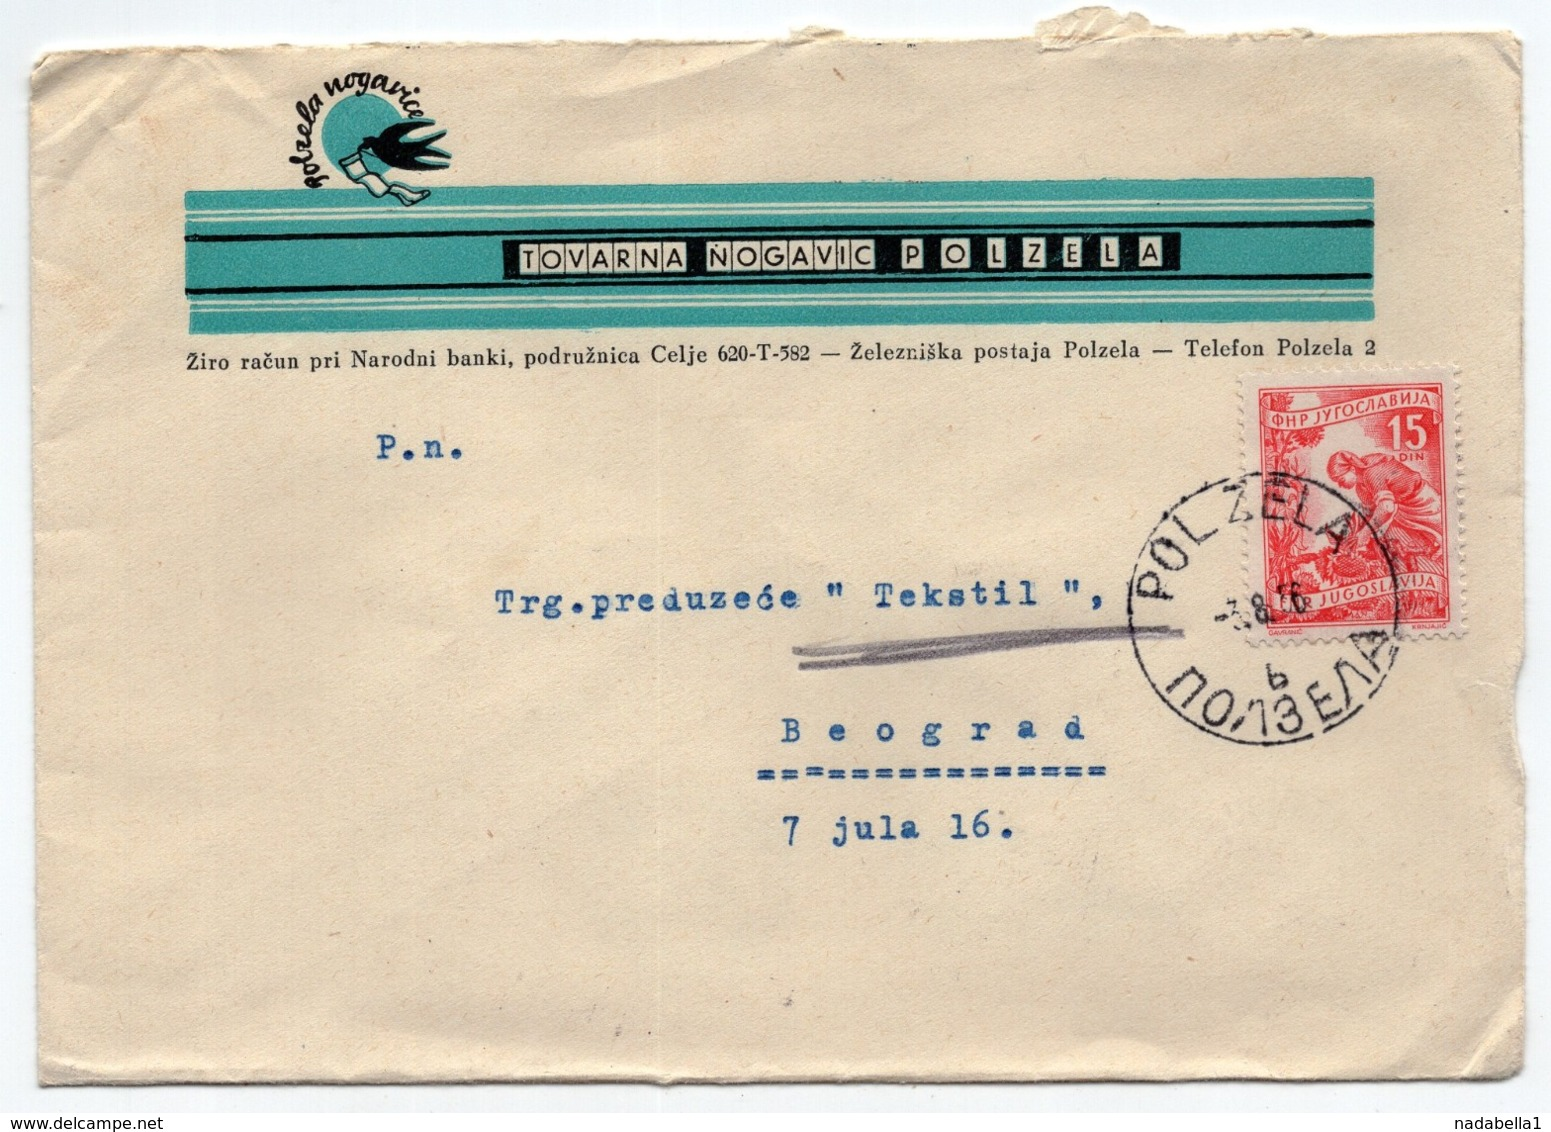 1956 YUGOSLAVIA, SLOVENIA, POLZELA TO BELGRADE, SOCKS MANUFACTURING COMPANY HEADCOVER - 1945-1992 Repubblica Socialista Federale Di Jugoslavia